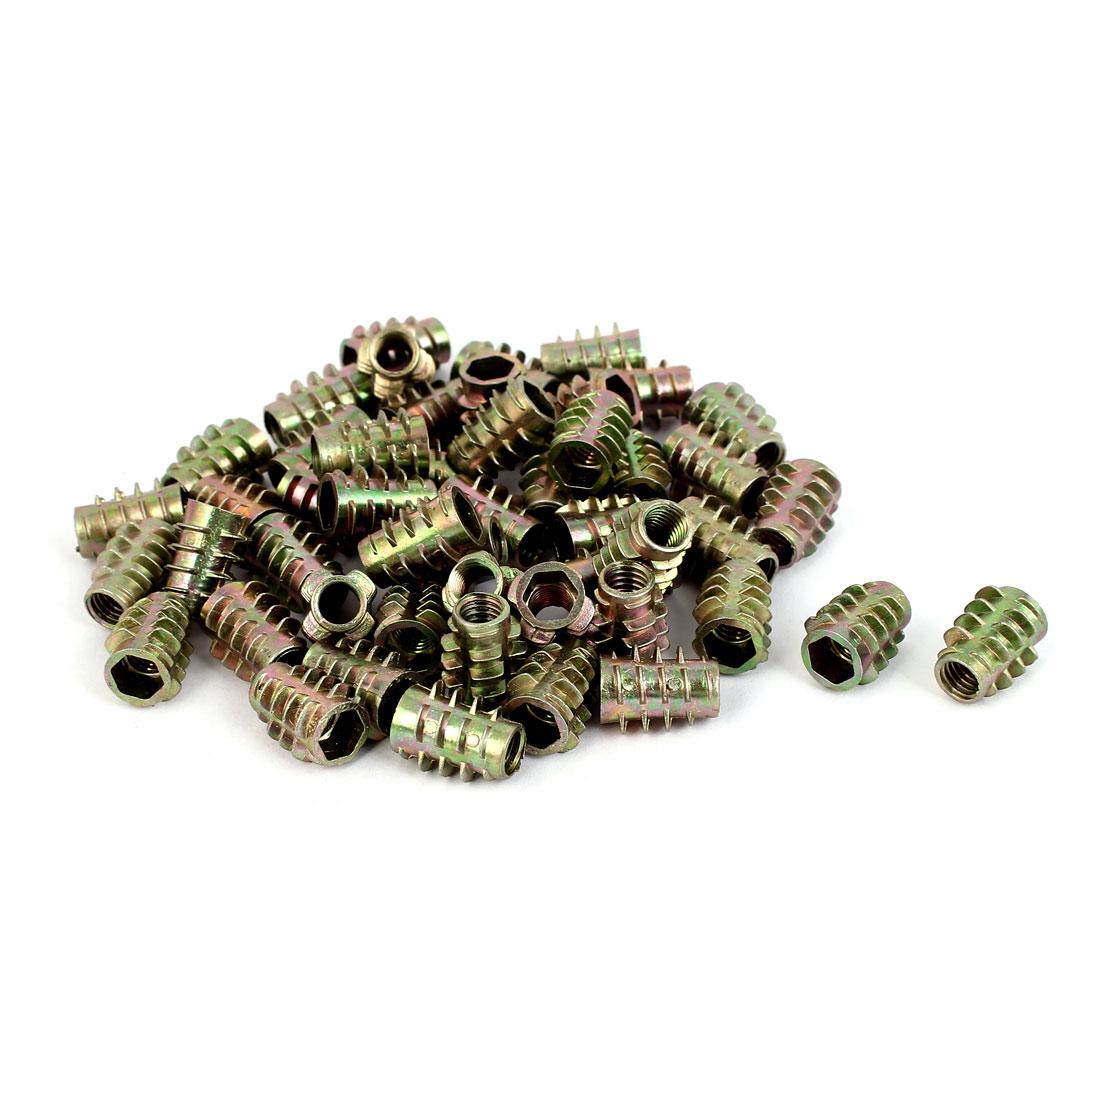 M6 Thread E-Nut Wood Insert Interface Screws Hex Socket Nut Fittings 50 Pcs